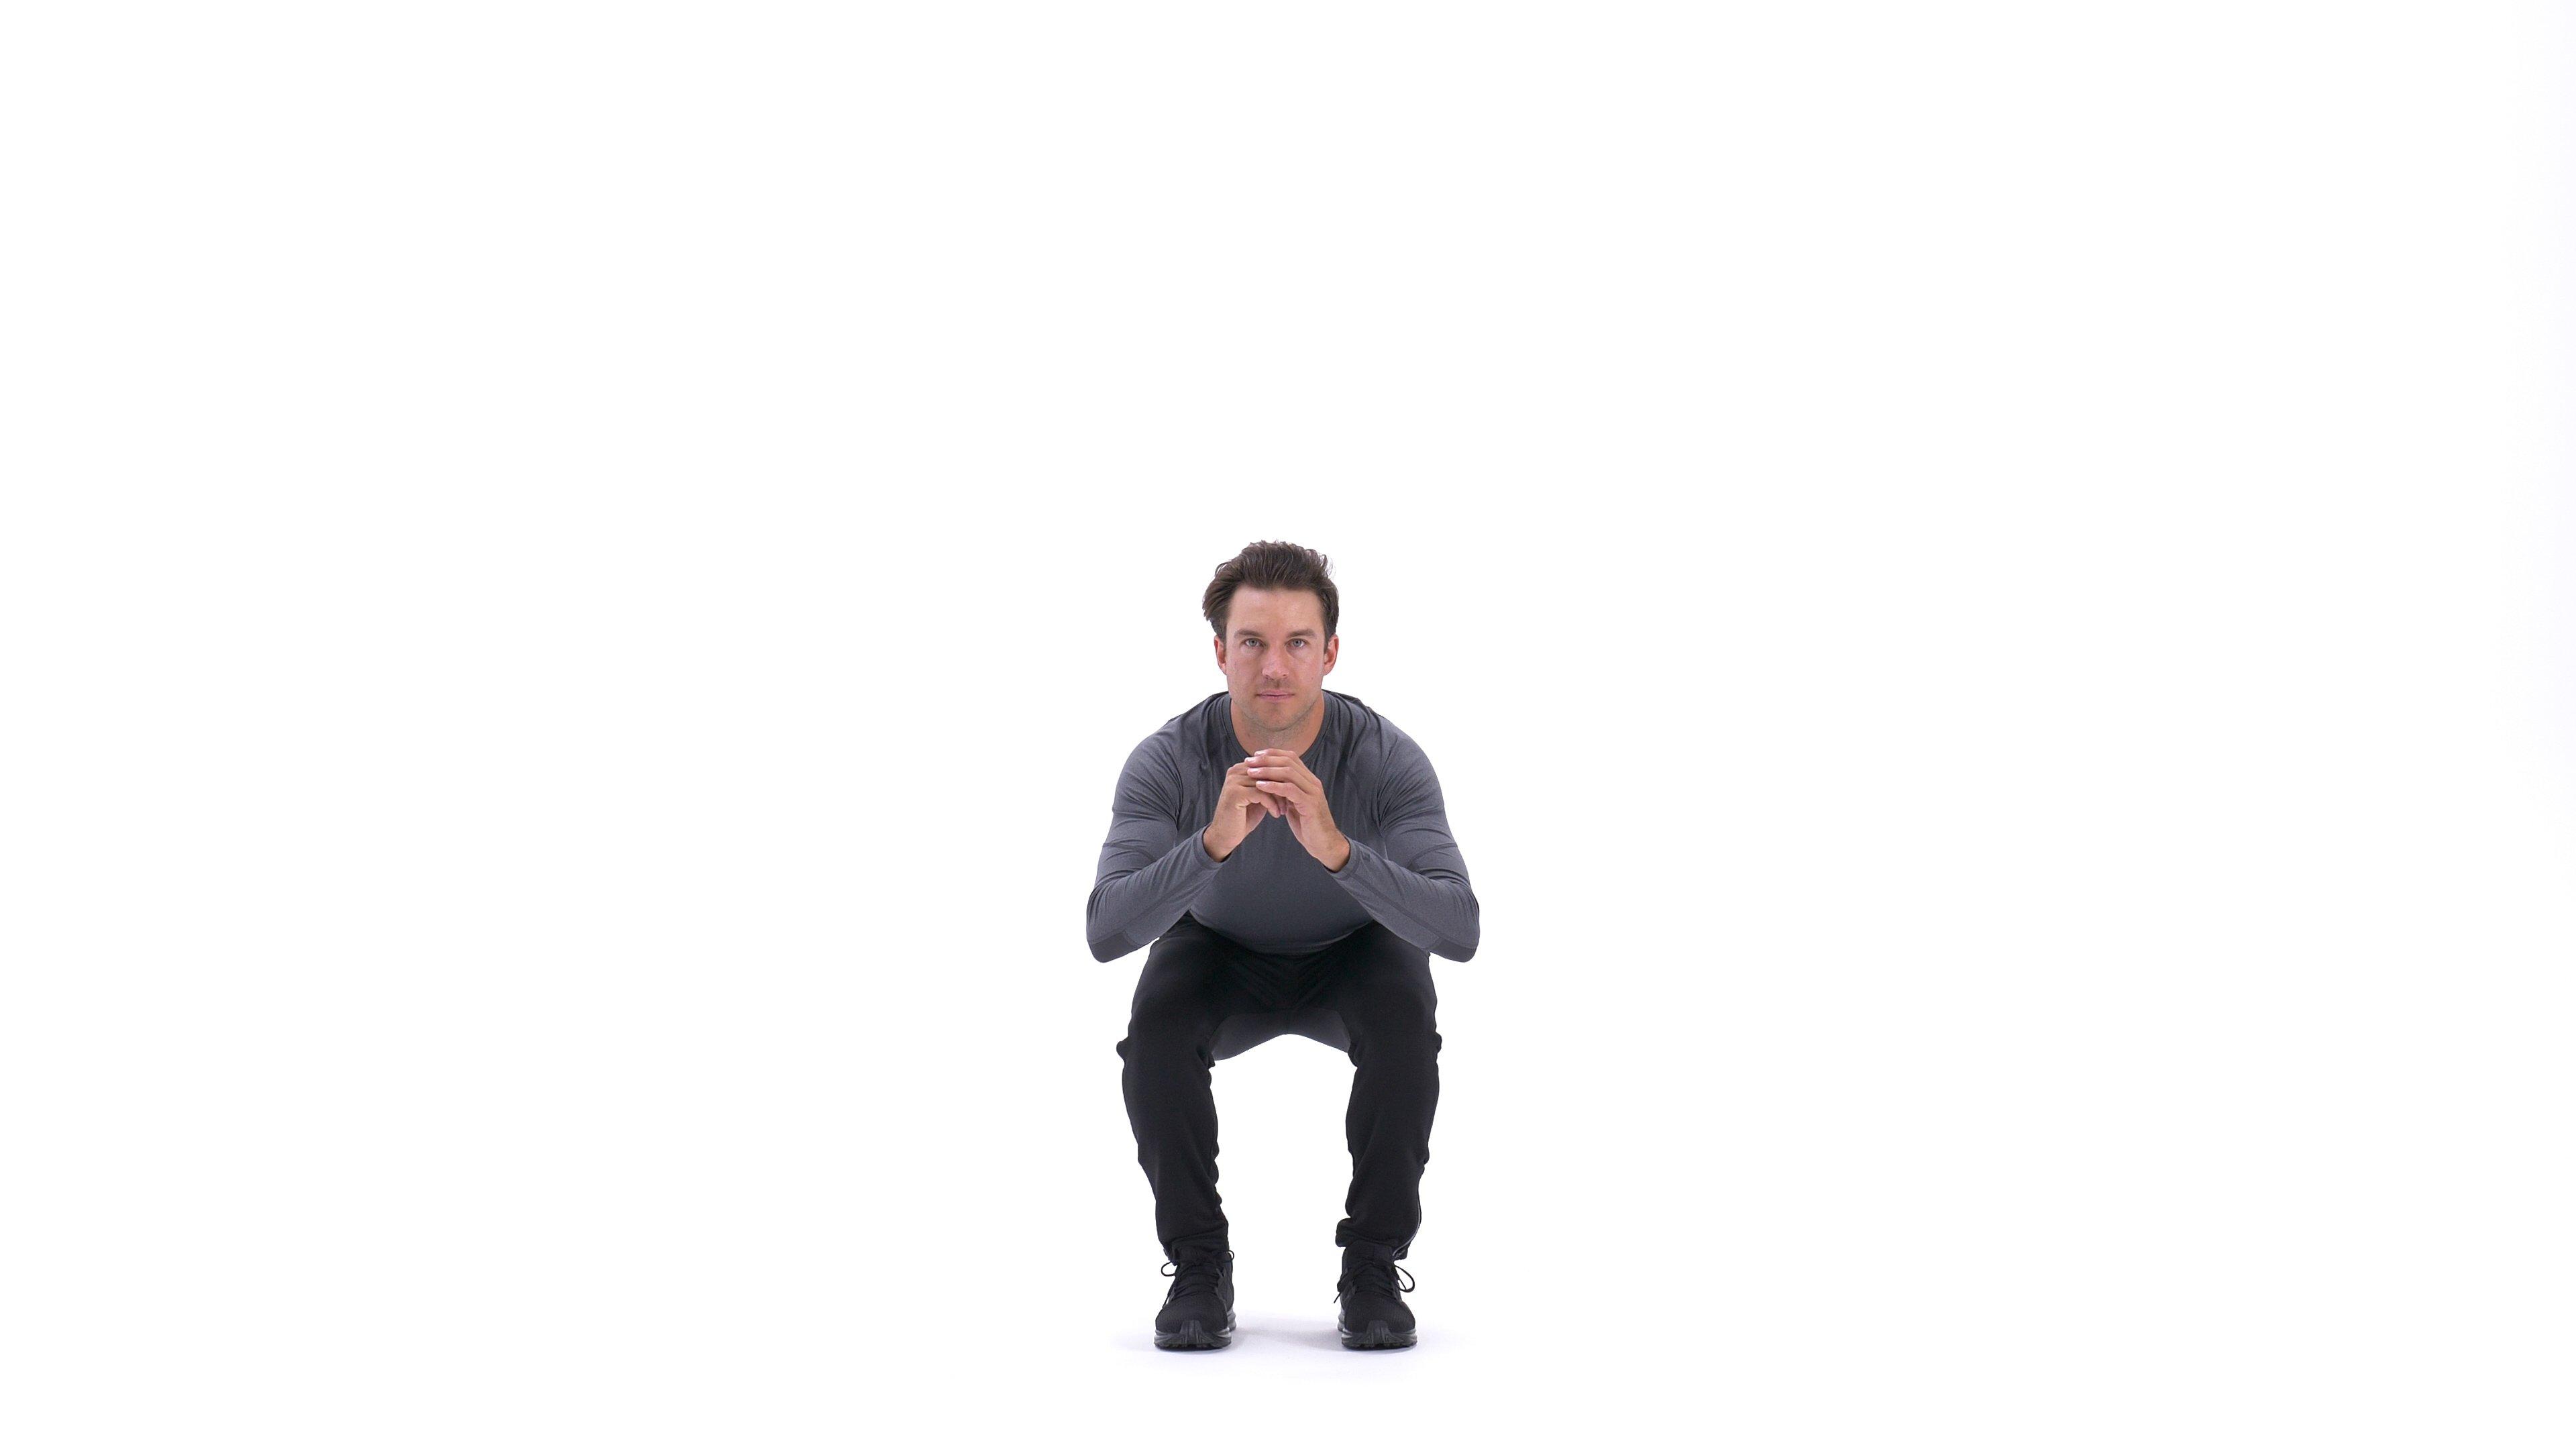 Narrow-stance squat image